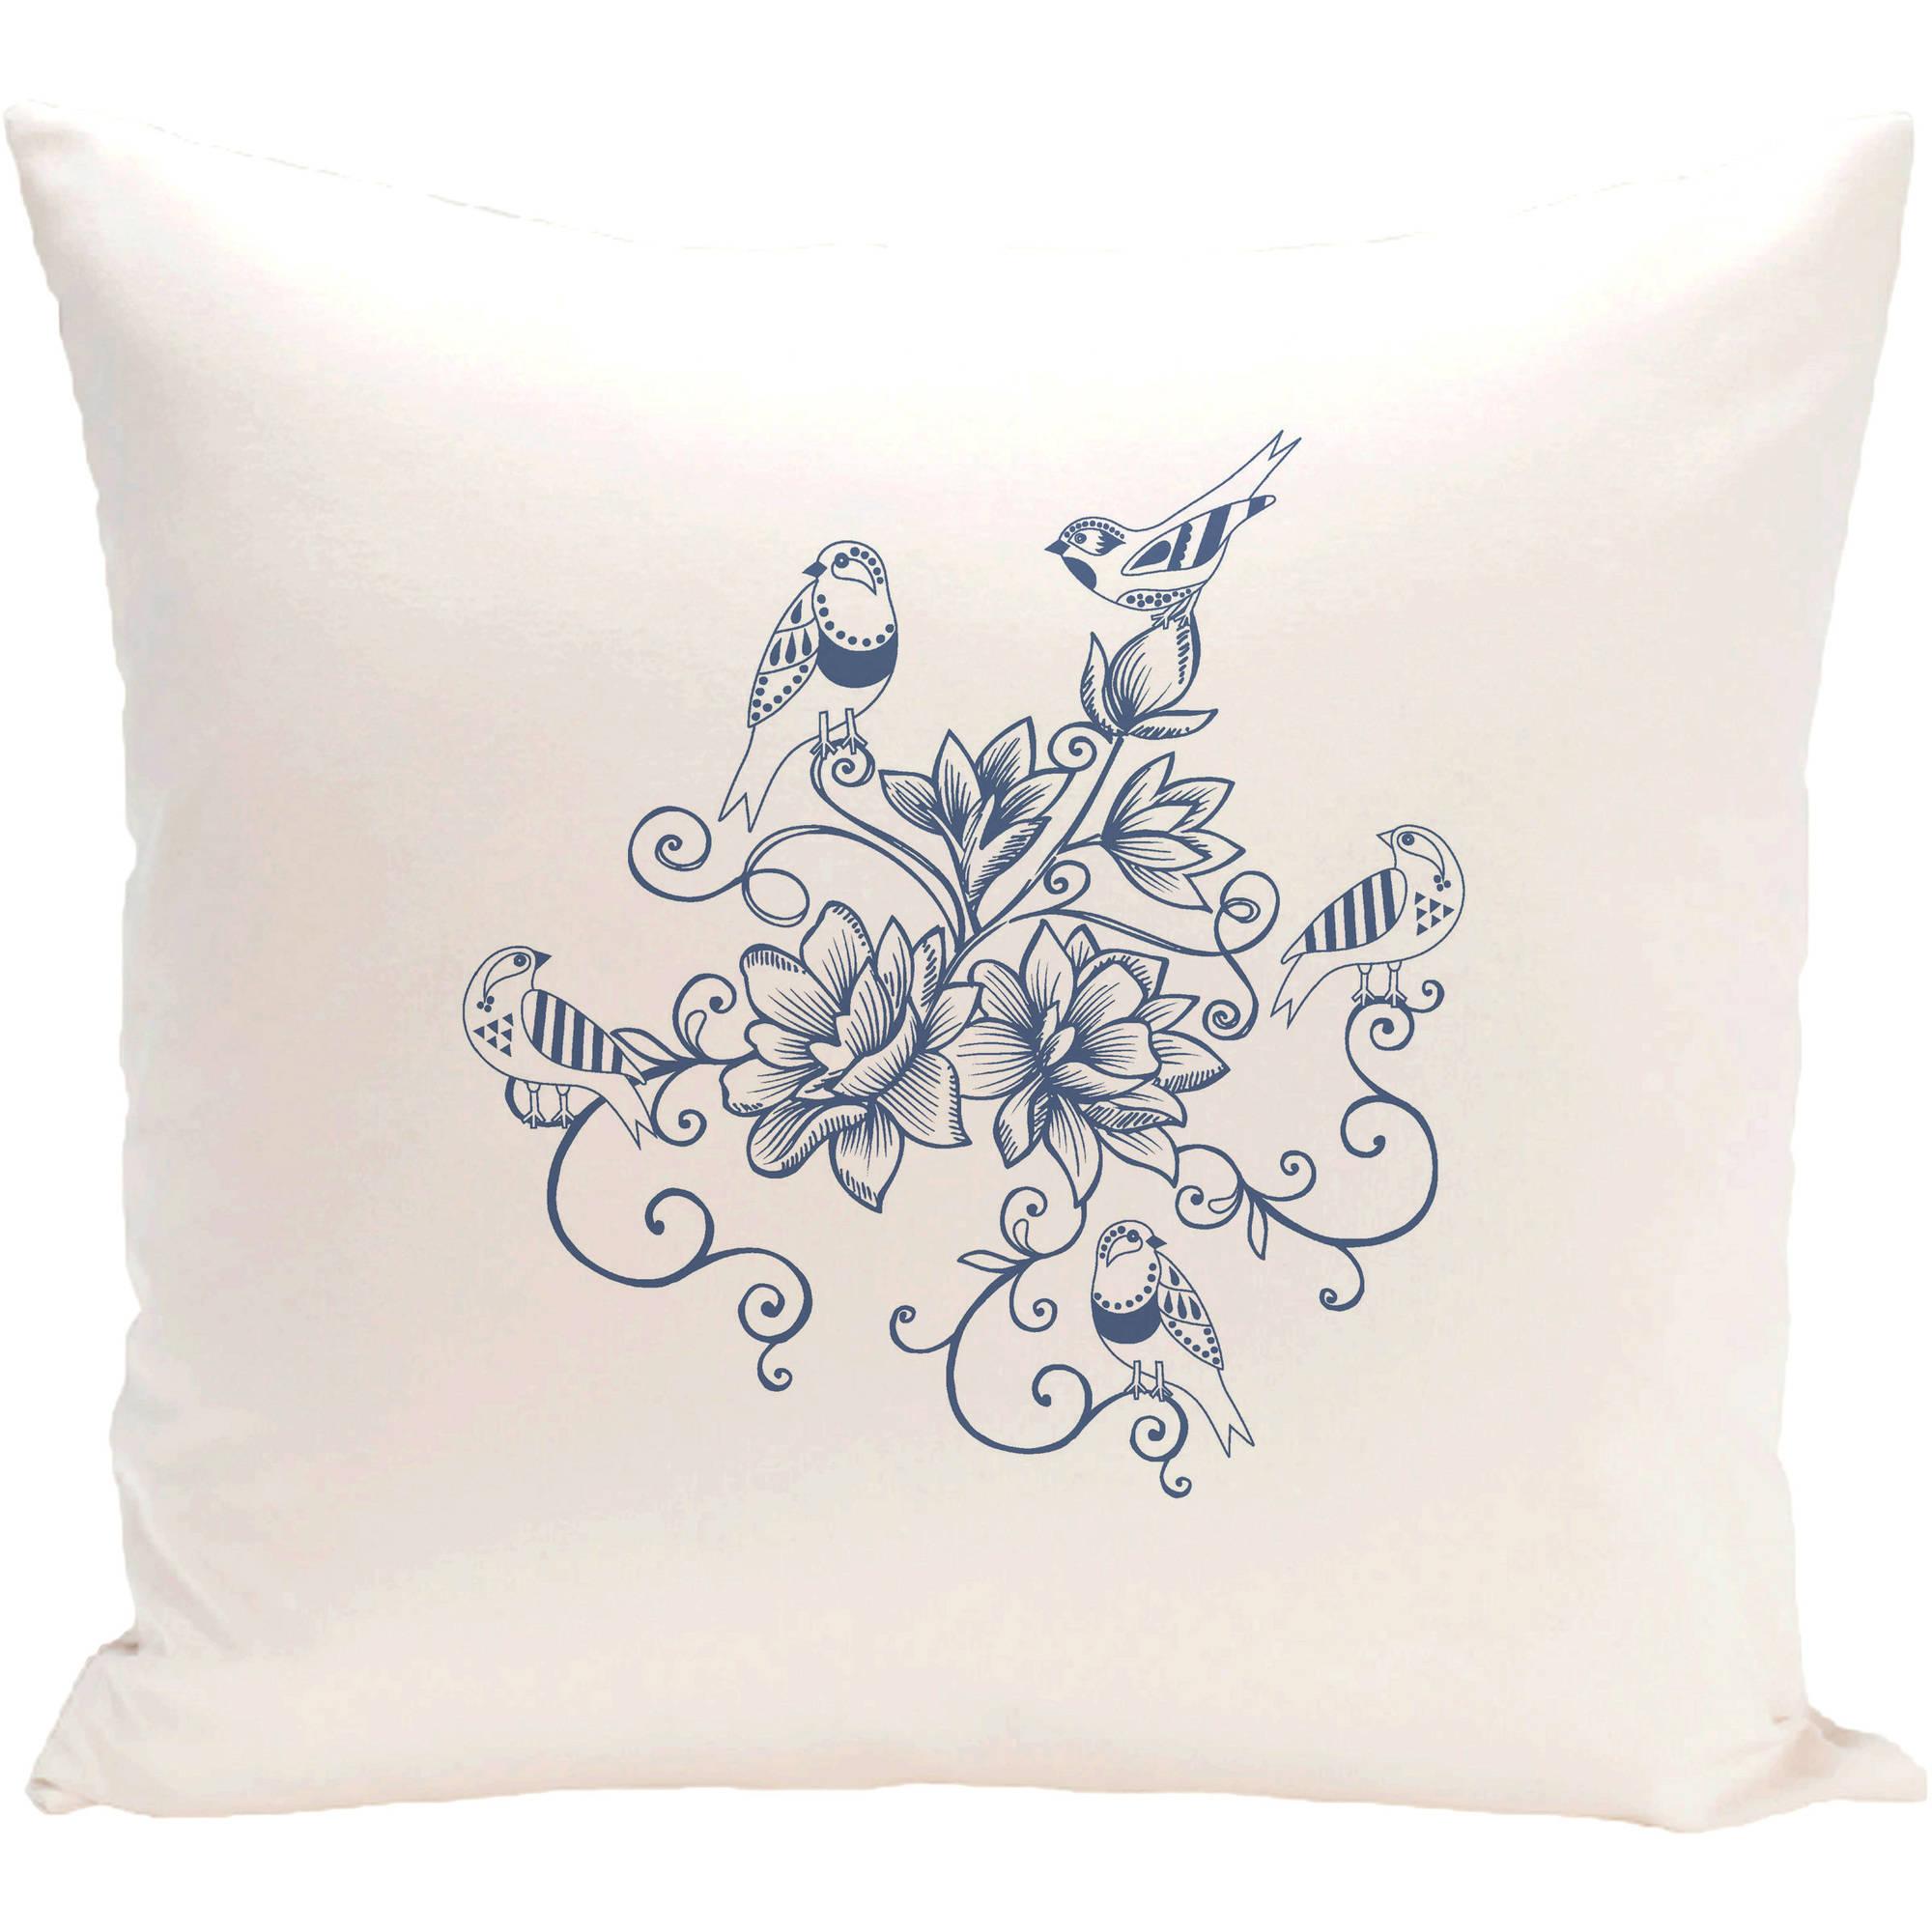 "Simply Daisy 16"" x 16"" Five Little Birds Floral Print Pillow"